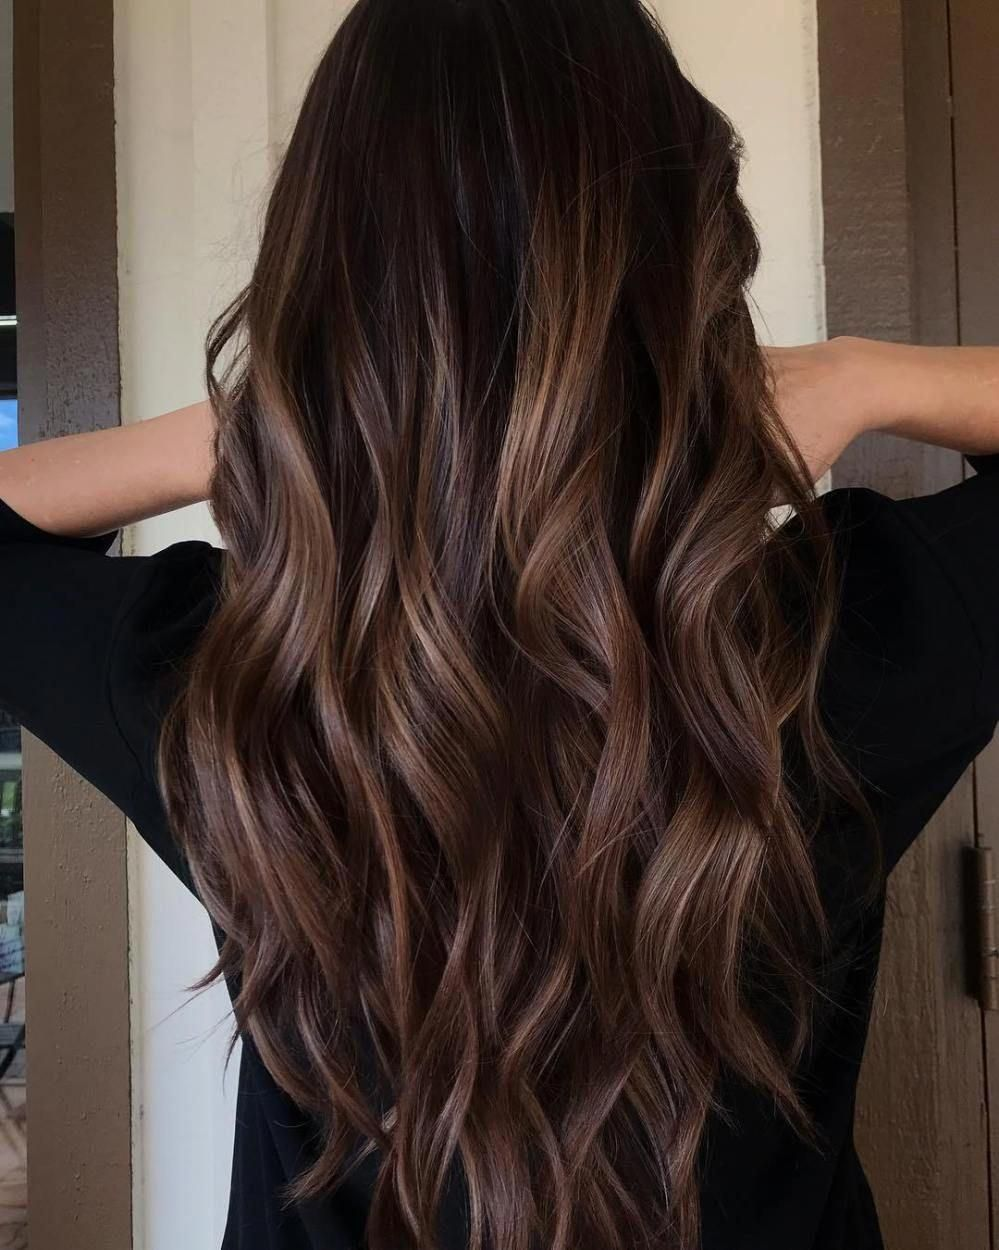 60 Hairstyles Featuring Dark Brown Hair With Highlights Blackhair Brown Hair Balayage Hair Styles Long Hair Styles